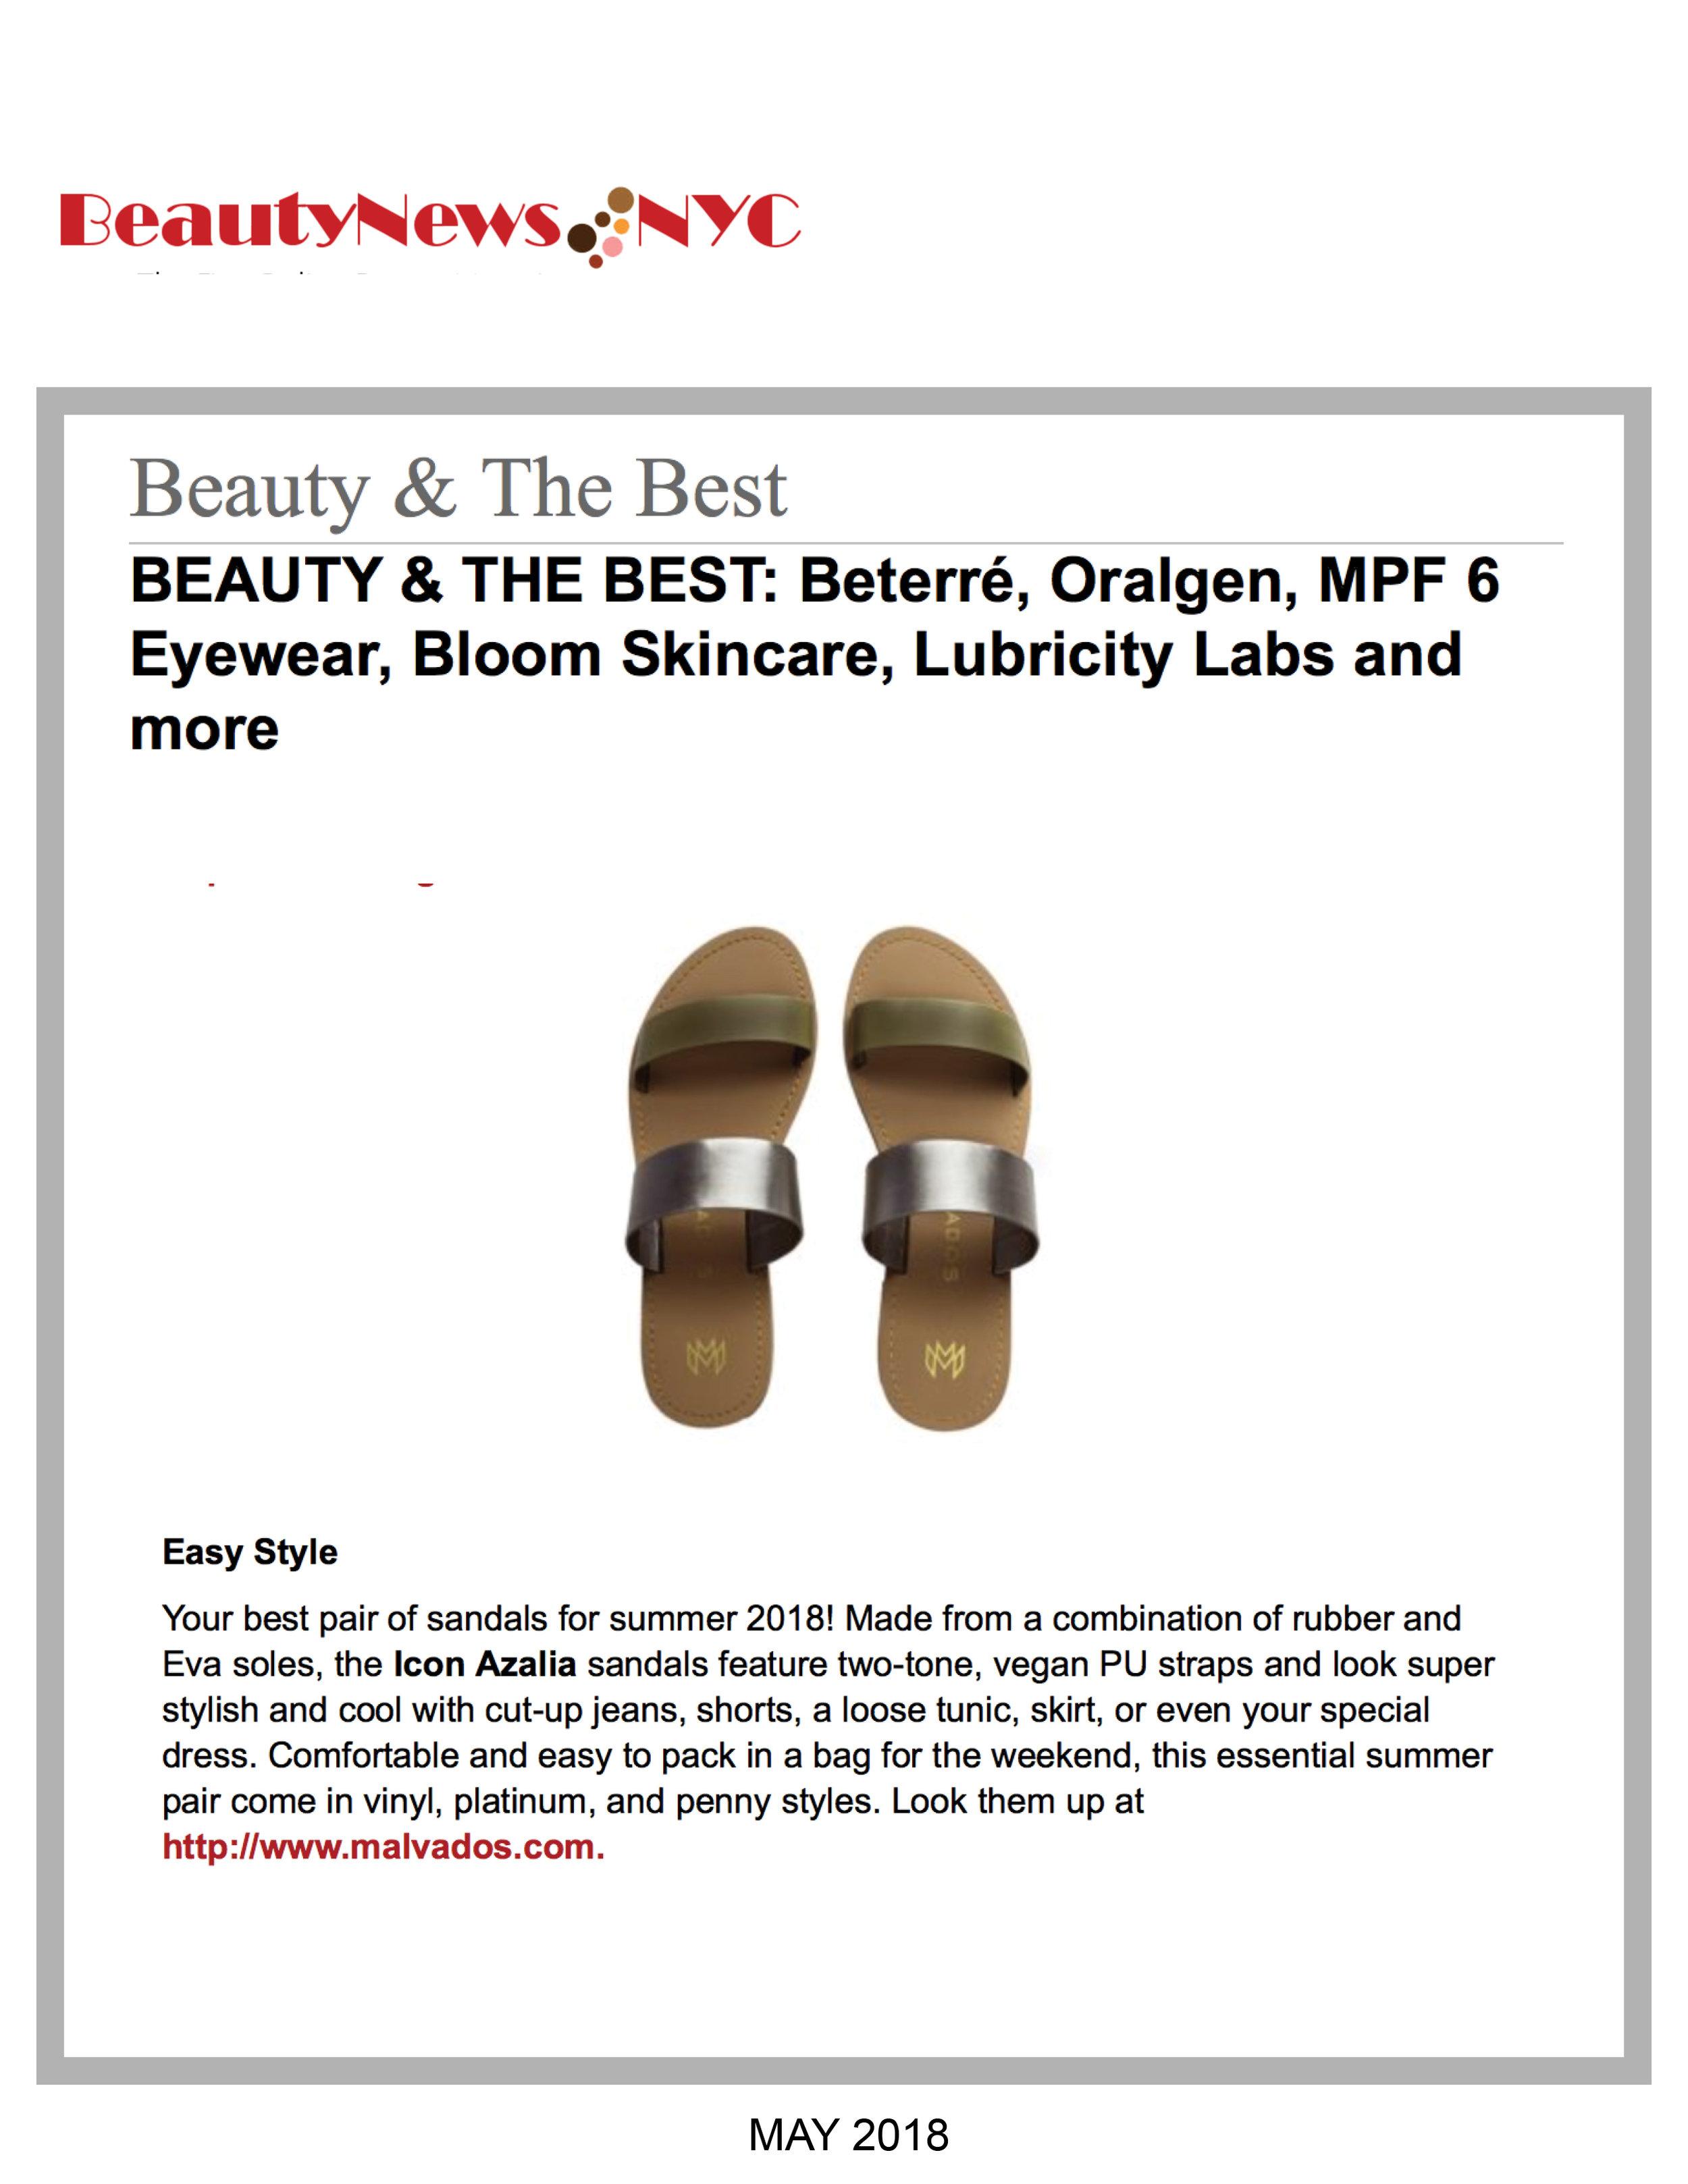 Malvados_BeautyNewsNYC_May2018.jpg